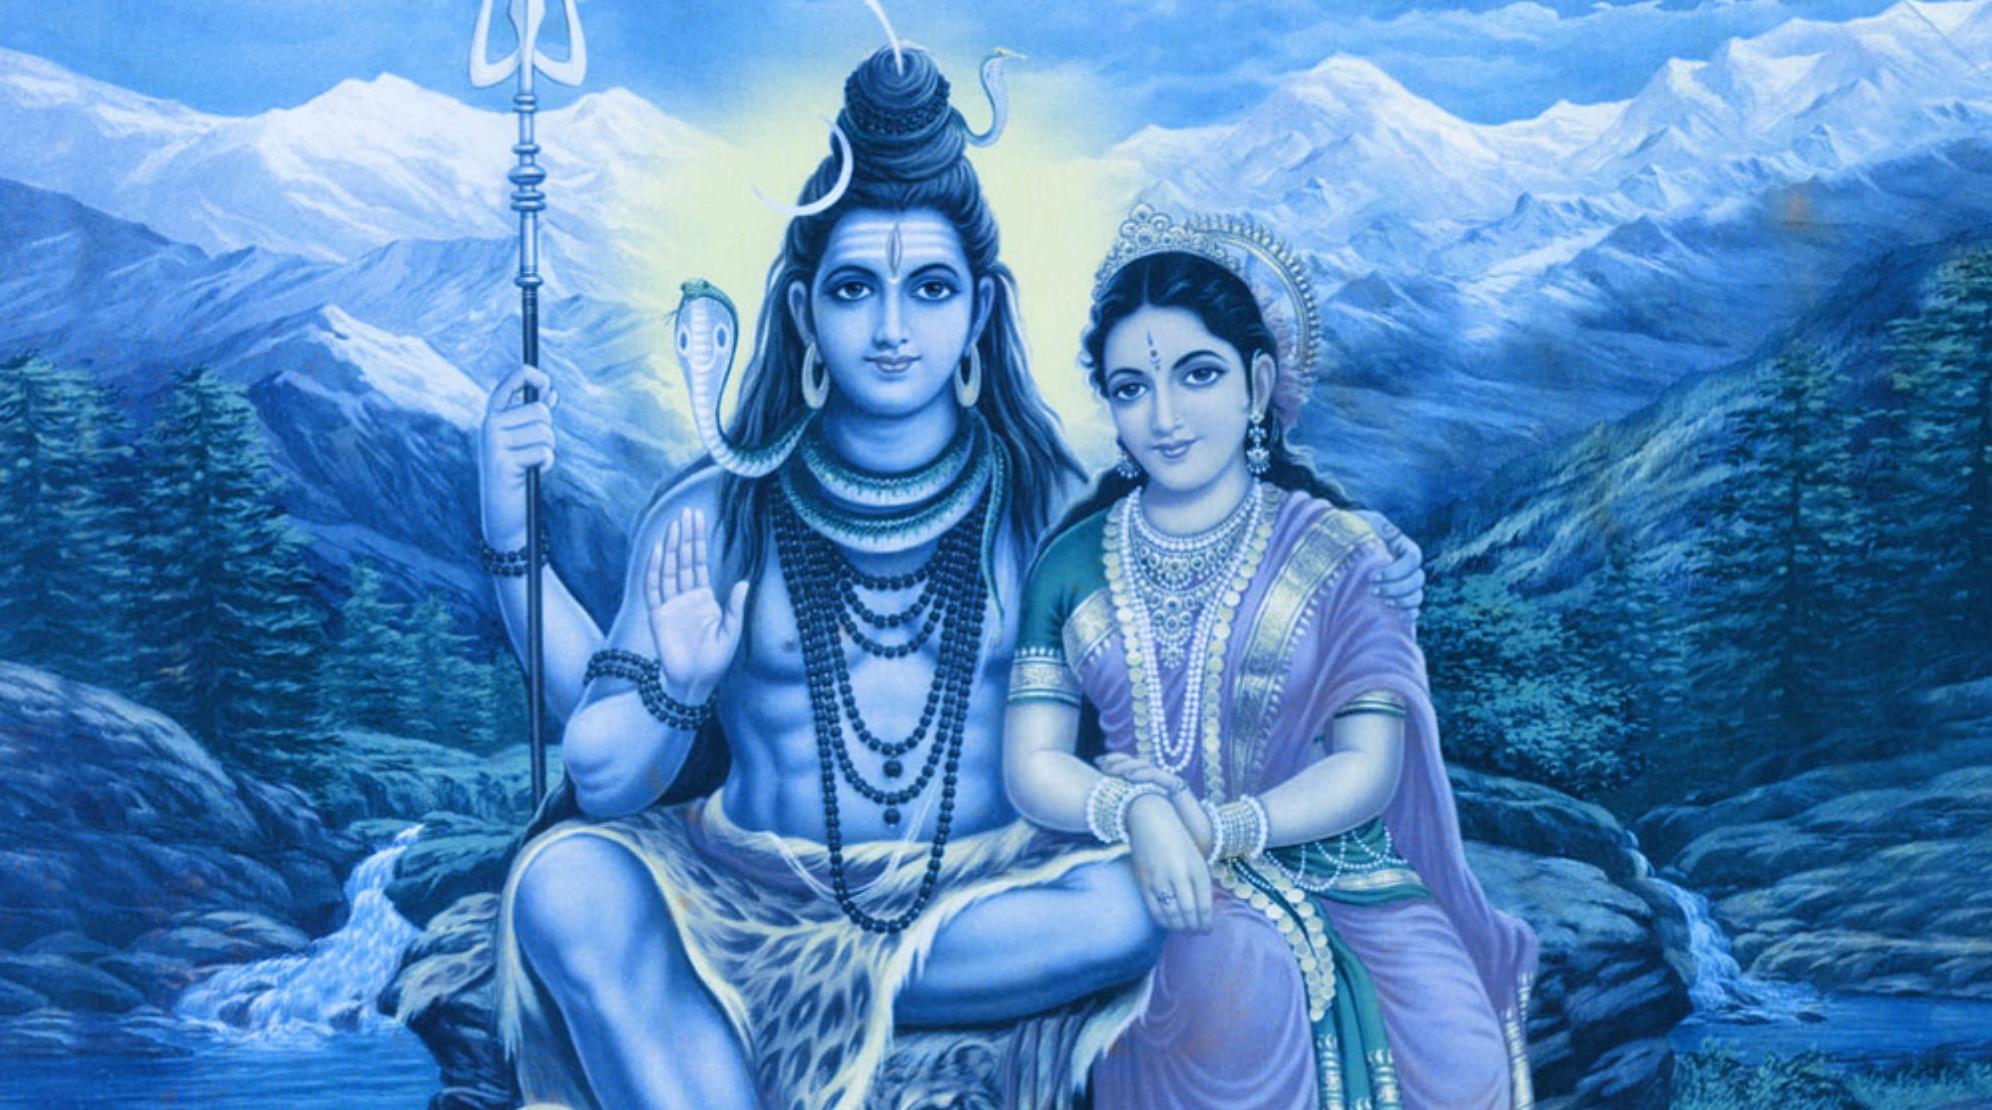 Who is Shiva?